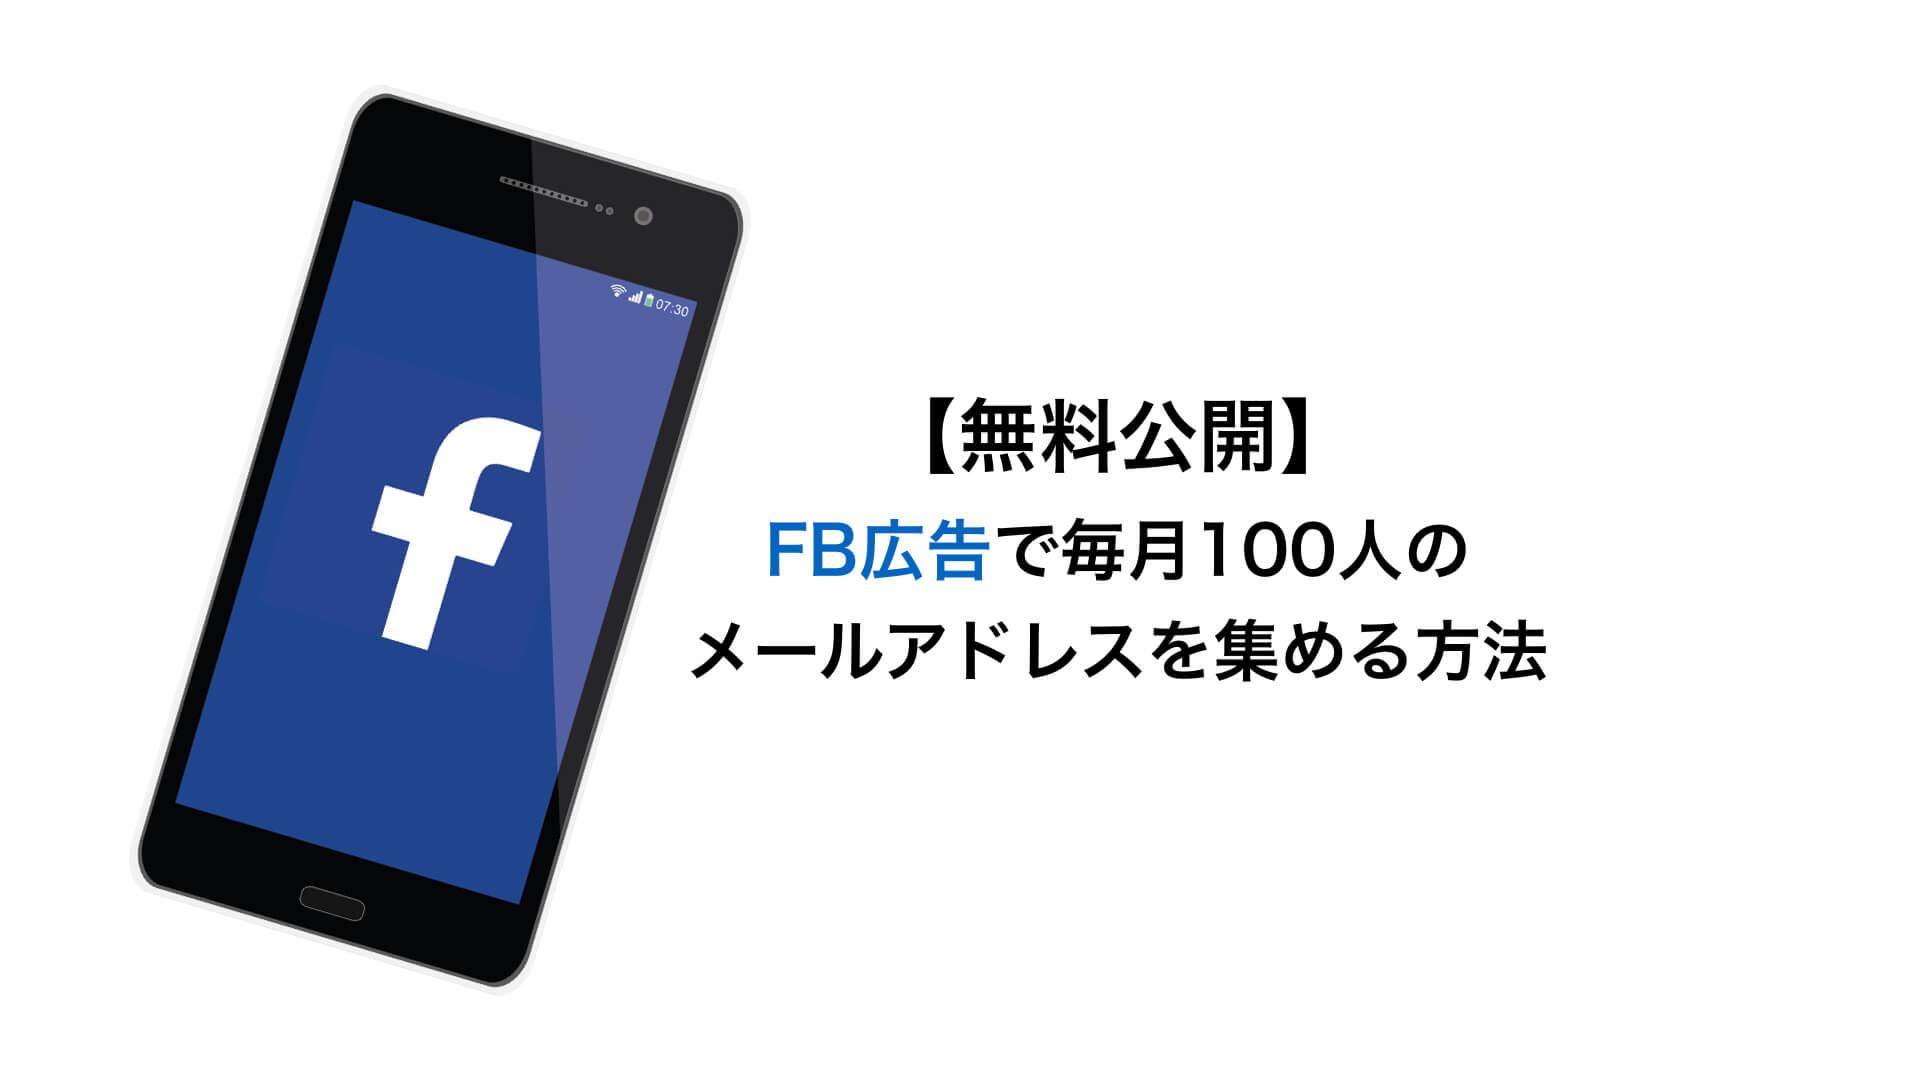 fb00.001